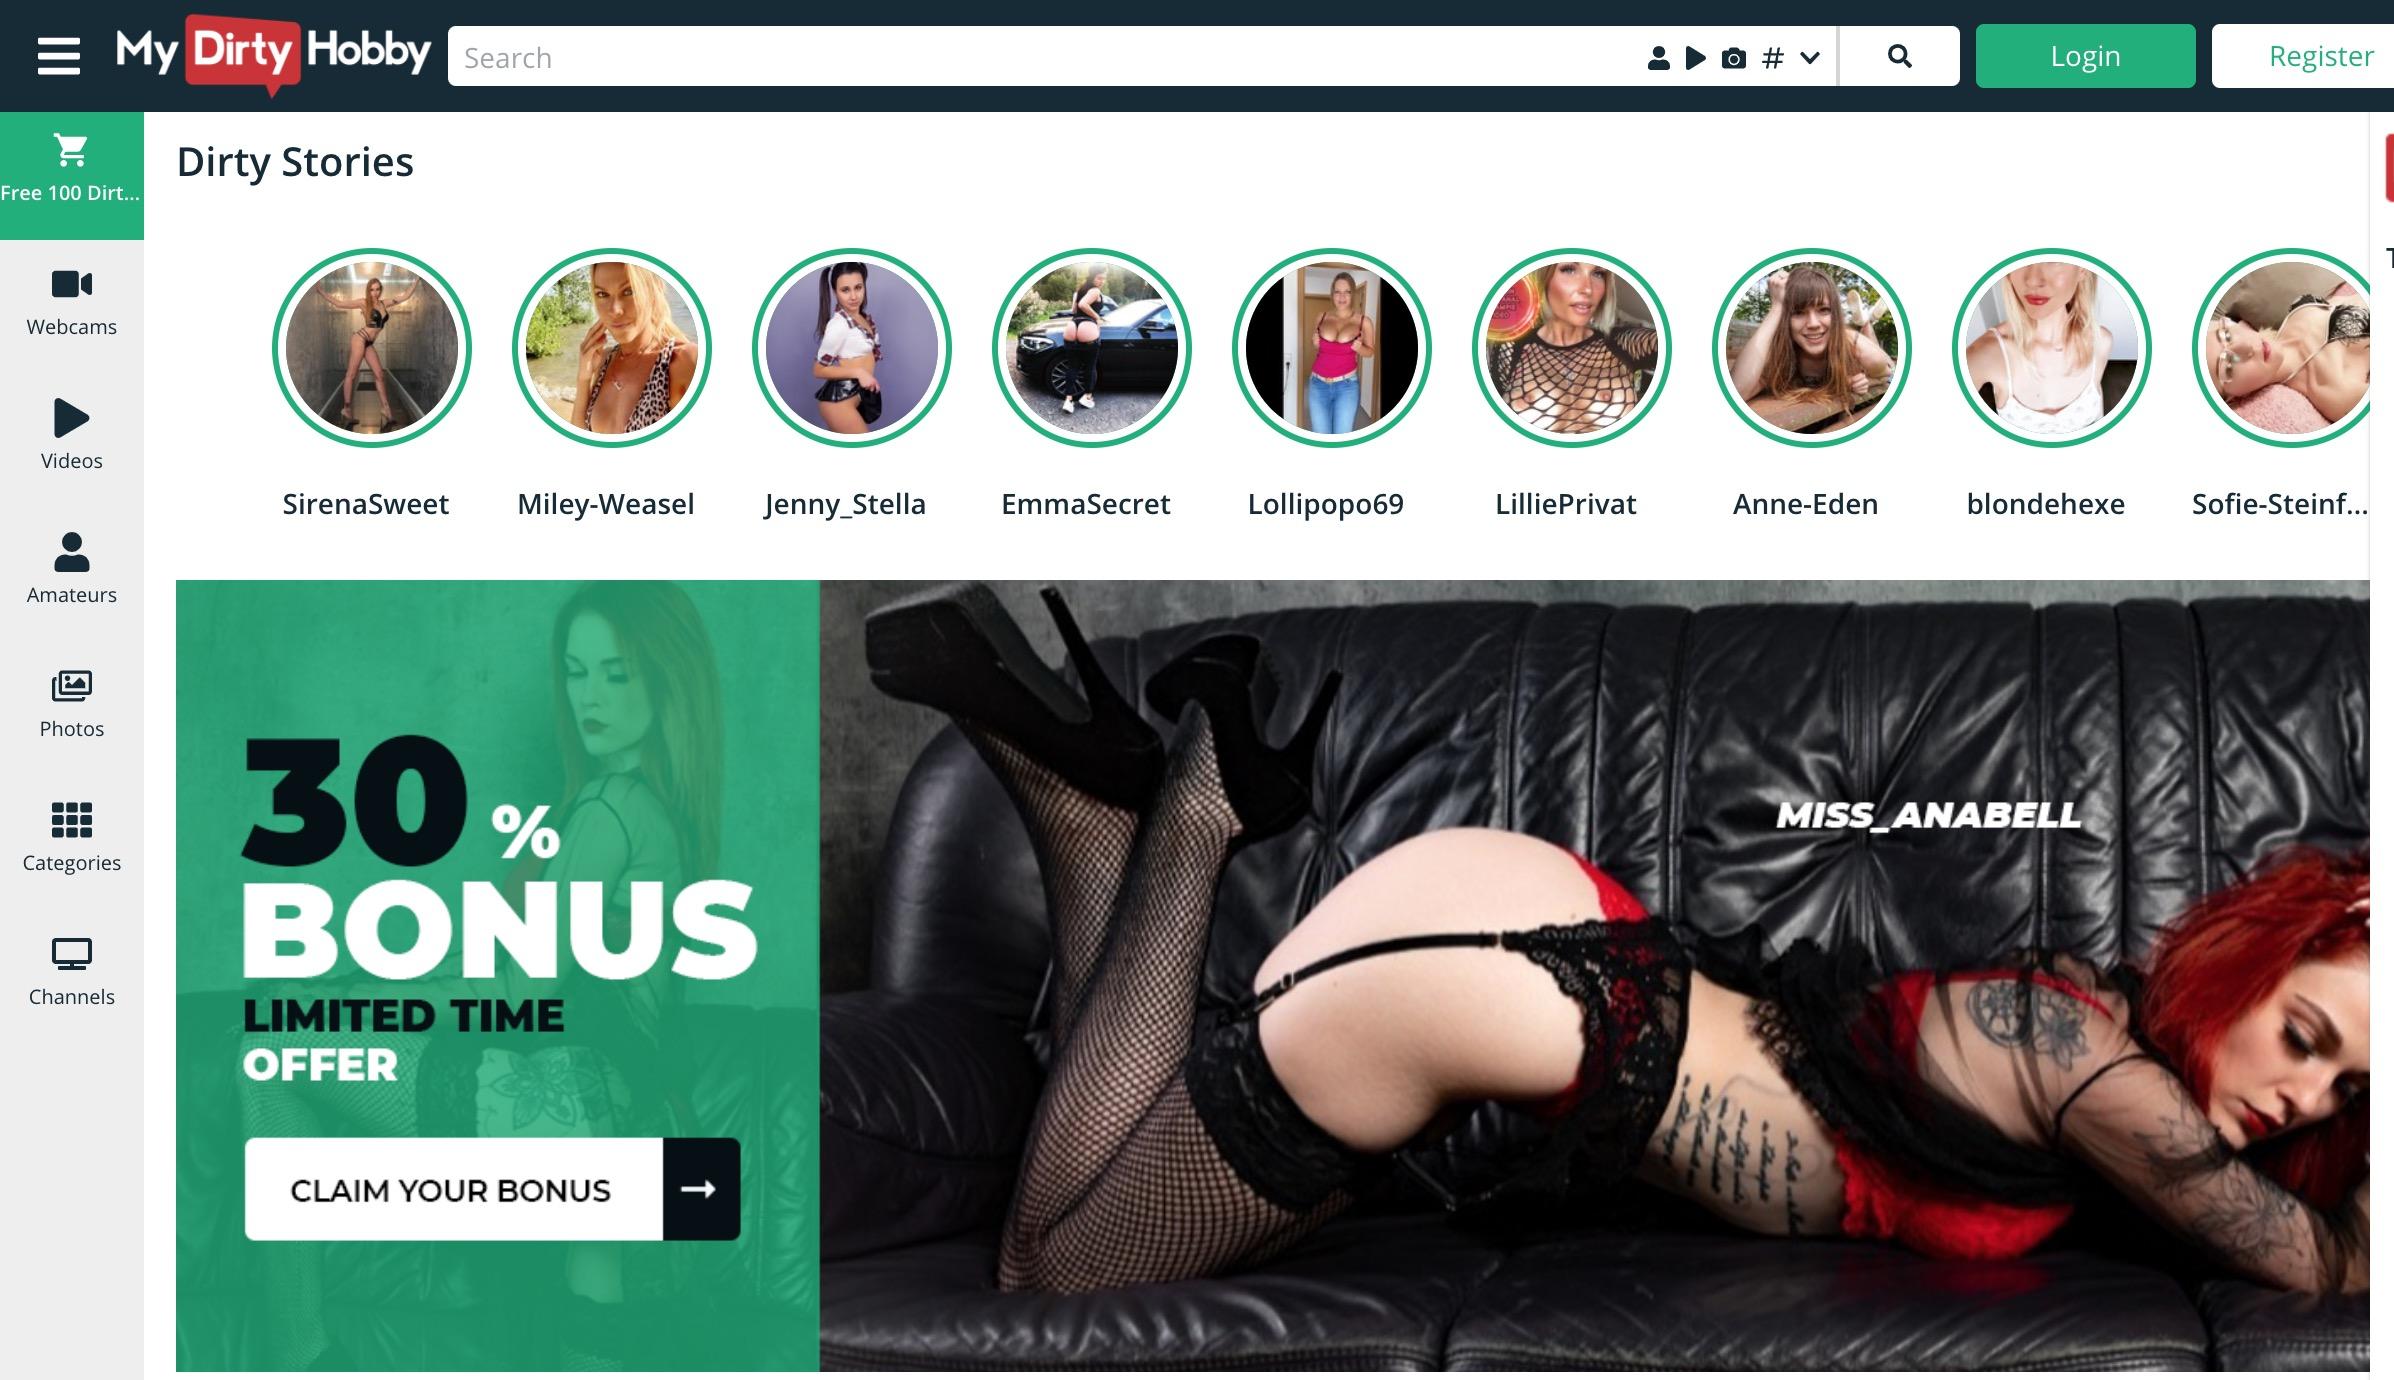 MyDirtyHobby main page